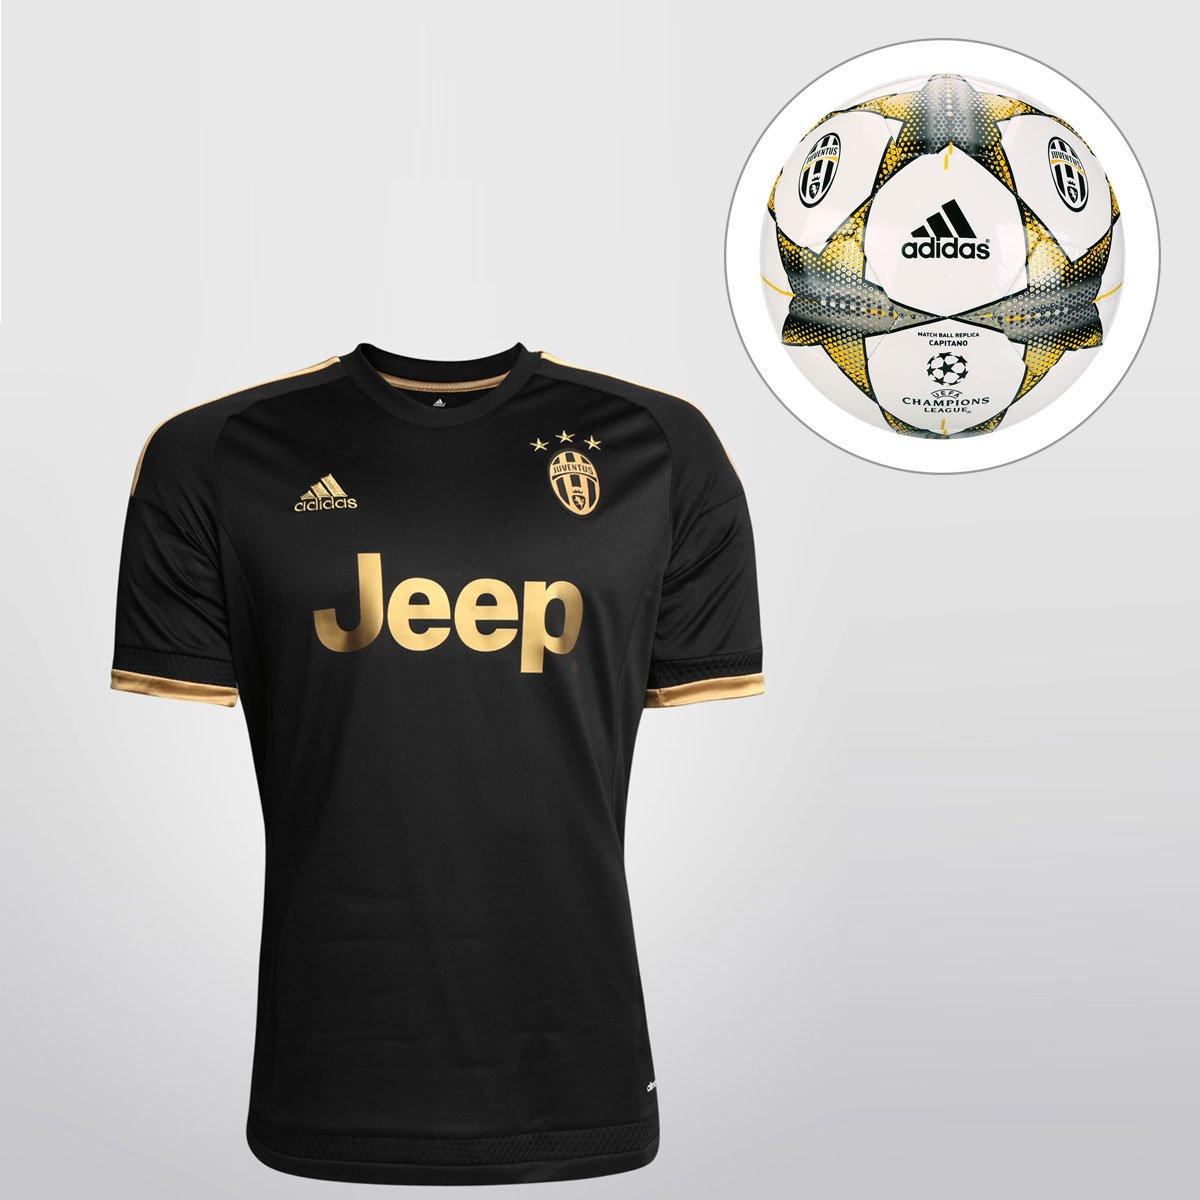 2312c72949148 Kit Camisa Adidas Juventus Third 15 16 s nº + Bola Adidas Juventus Finale 15  Campo - Compre Agora